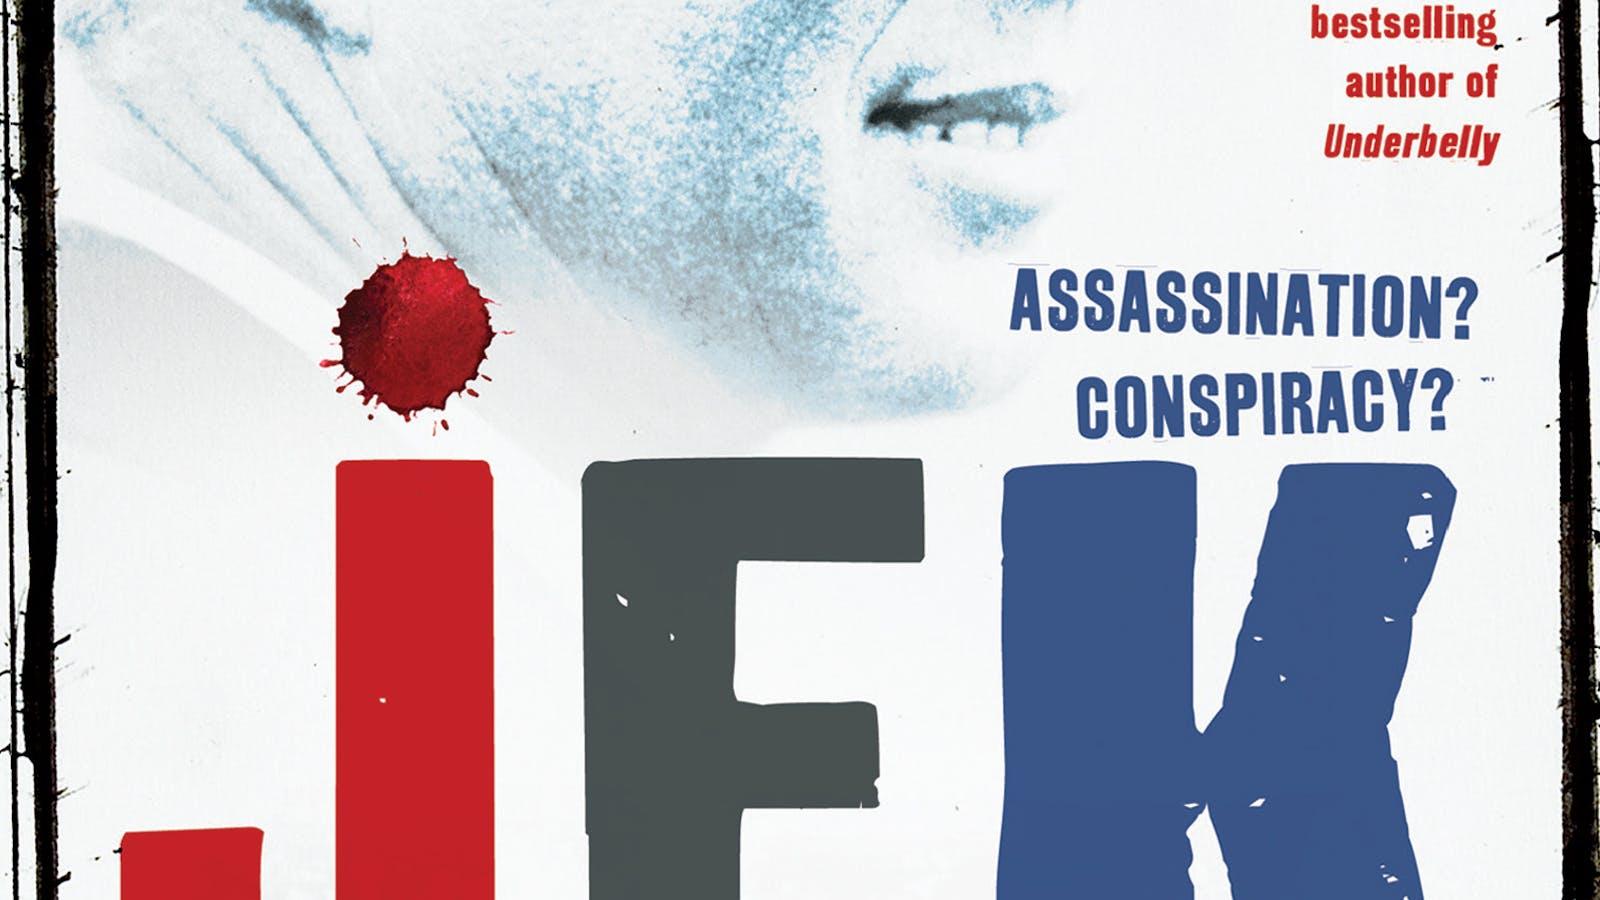 JFK: The Smoking Gun (2013) directed by Malcolm McDonald